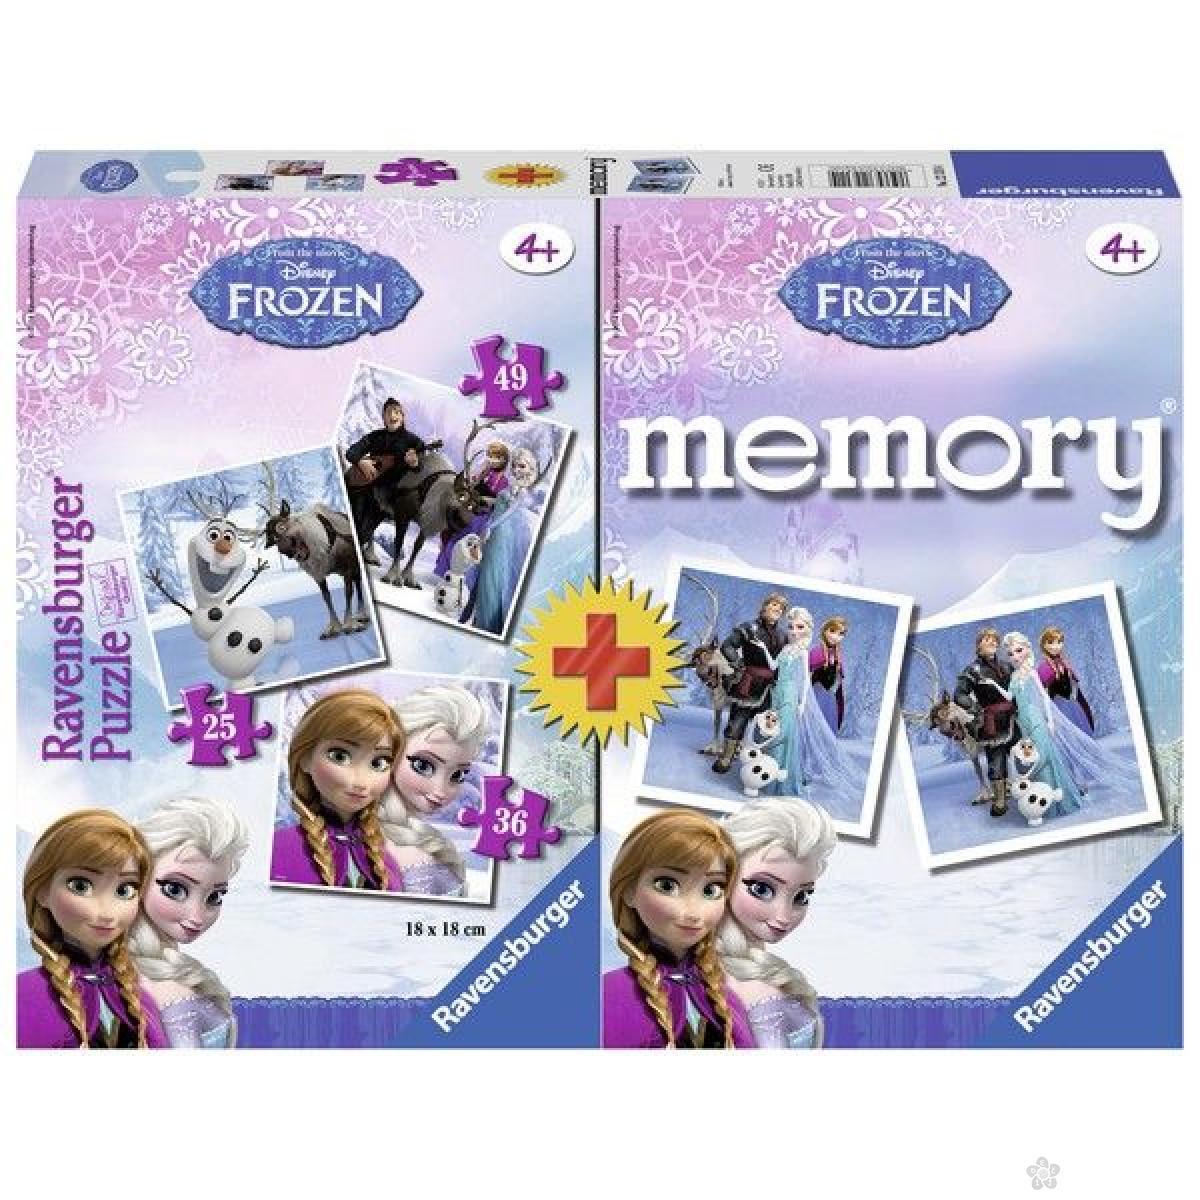 Ravensburger društvena igra -  Frozen puzle + memorija RA22311